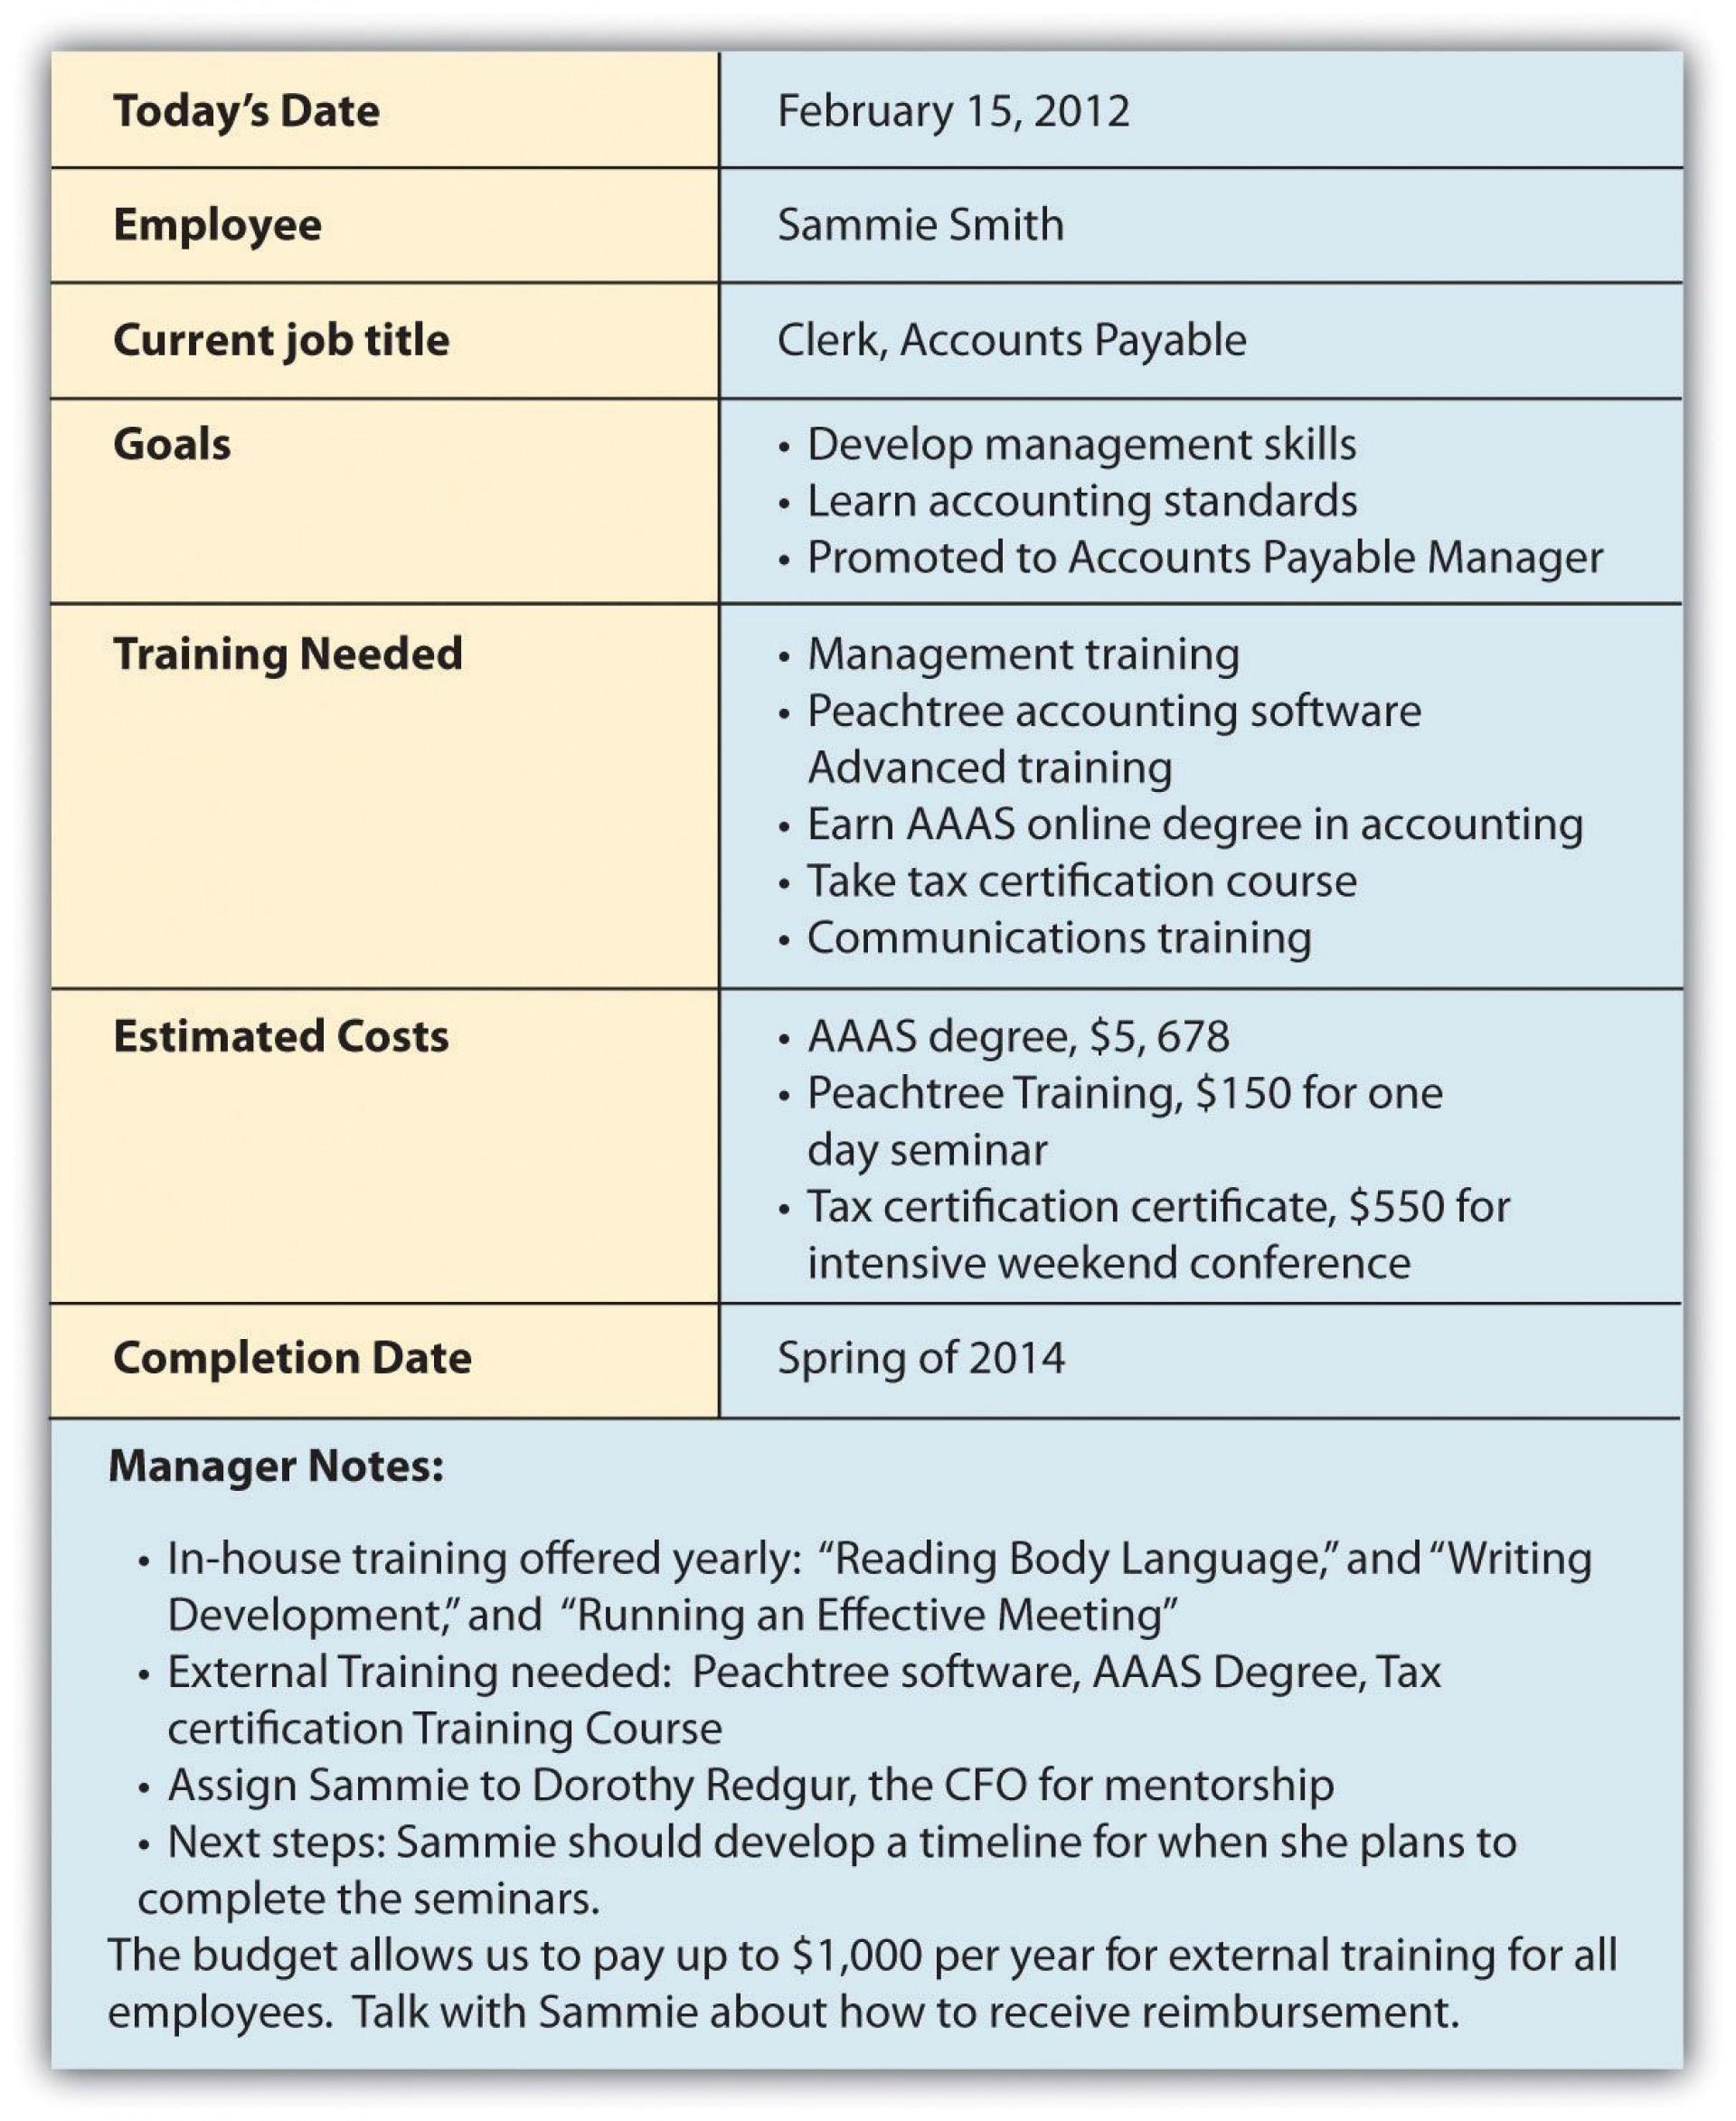 006 Astounding Employee Development Action Plan Example Concept  Examples1920